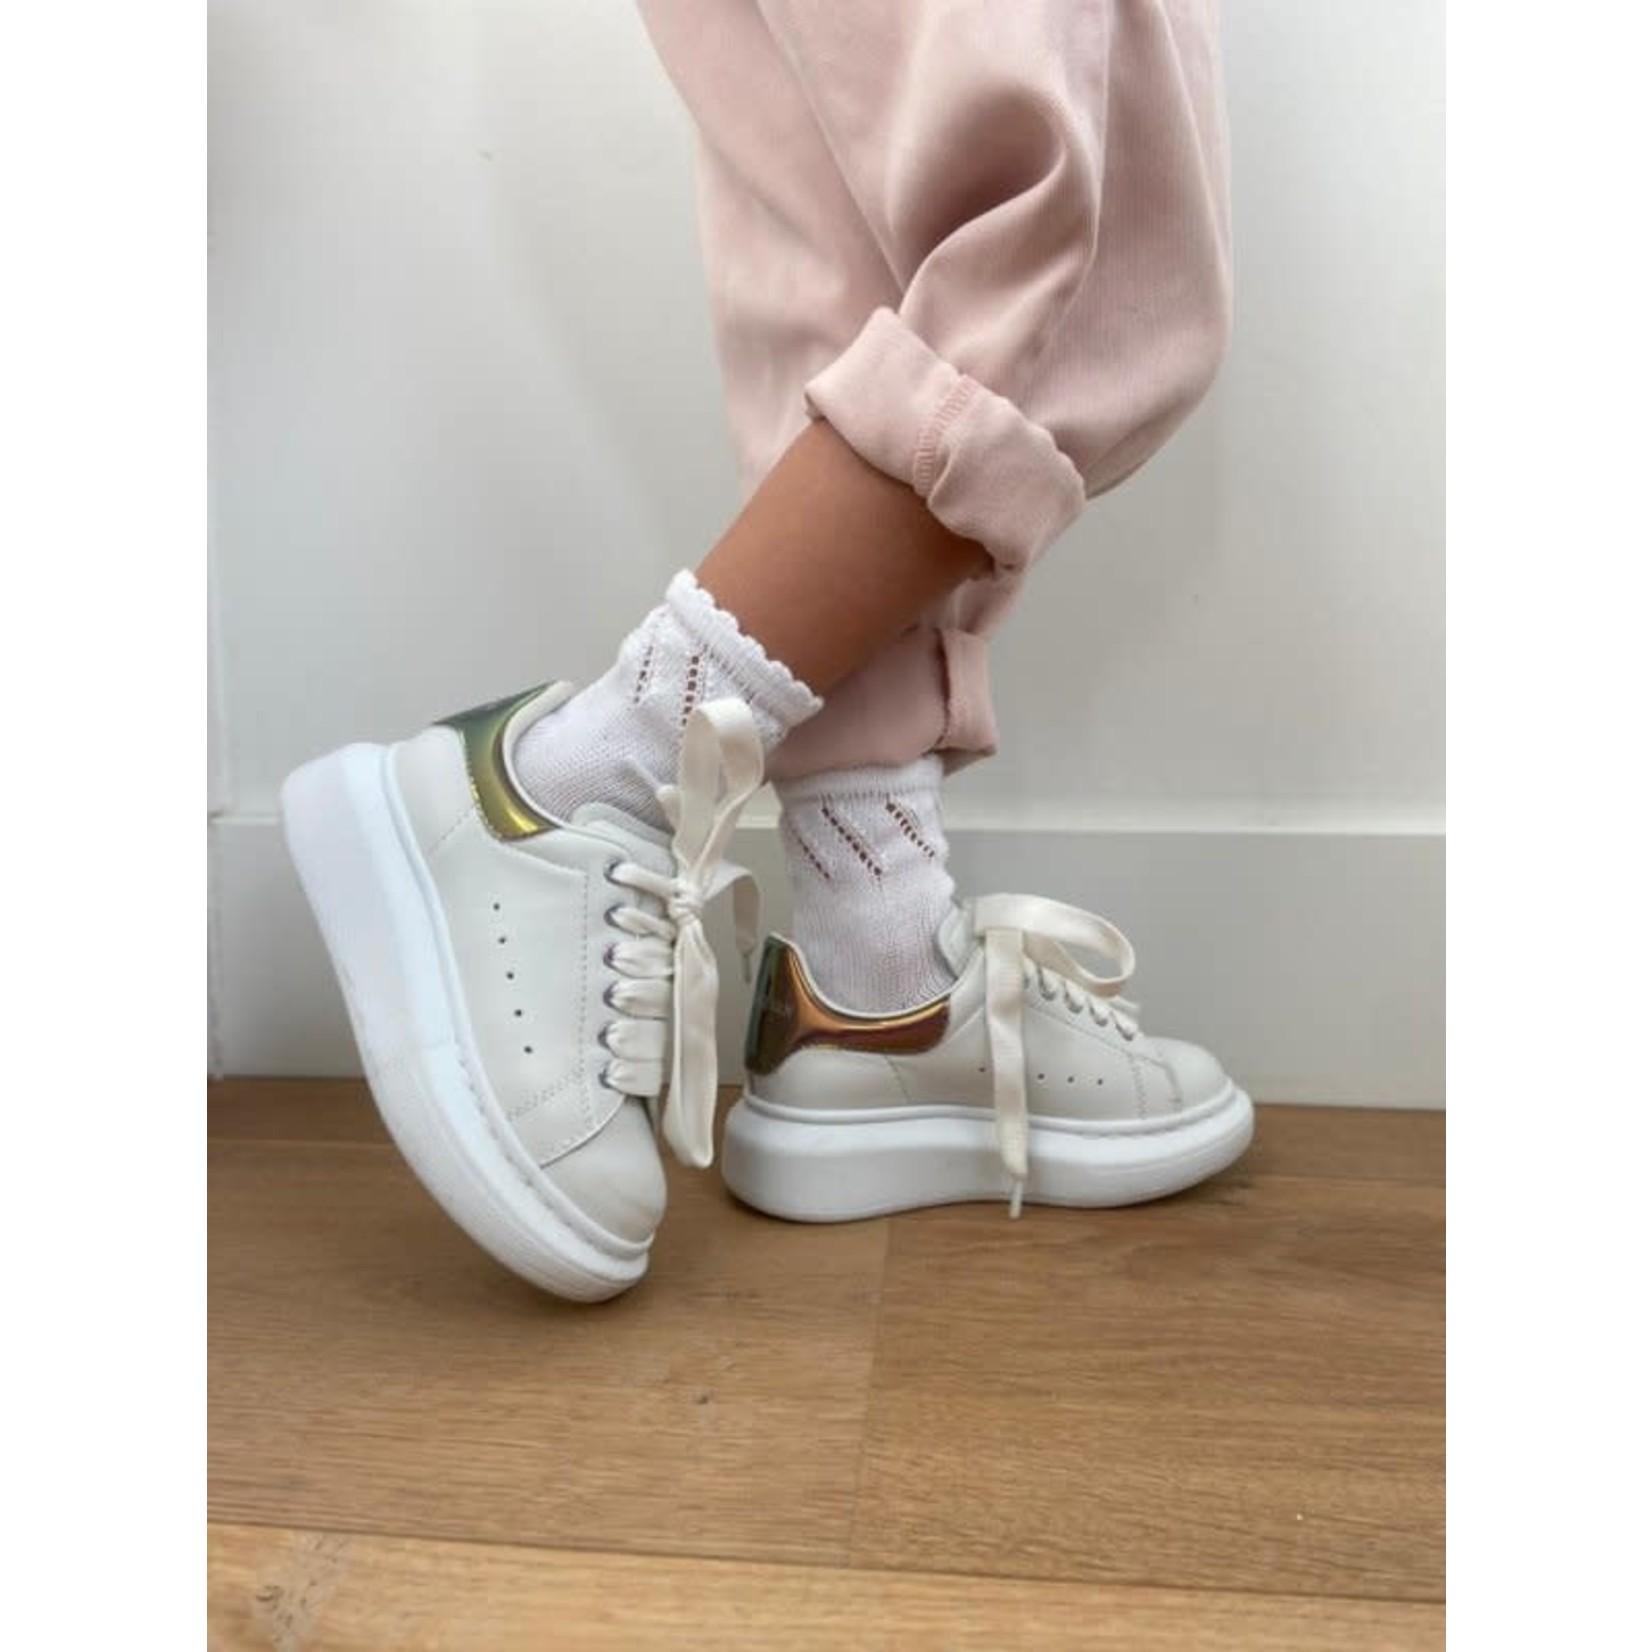 Condor Socks White